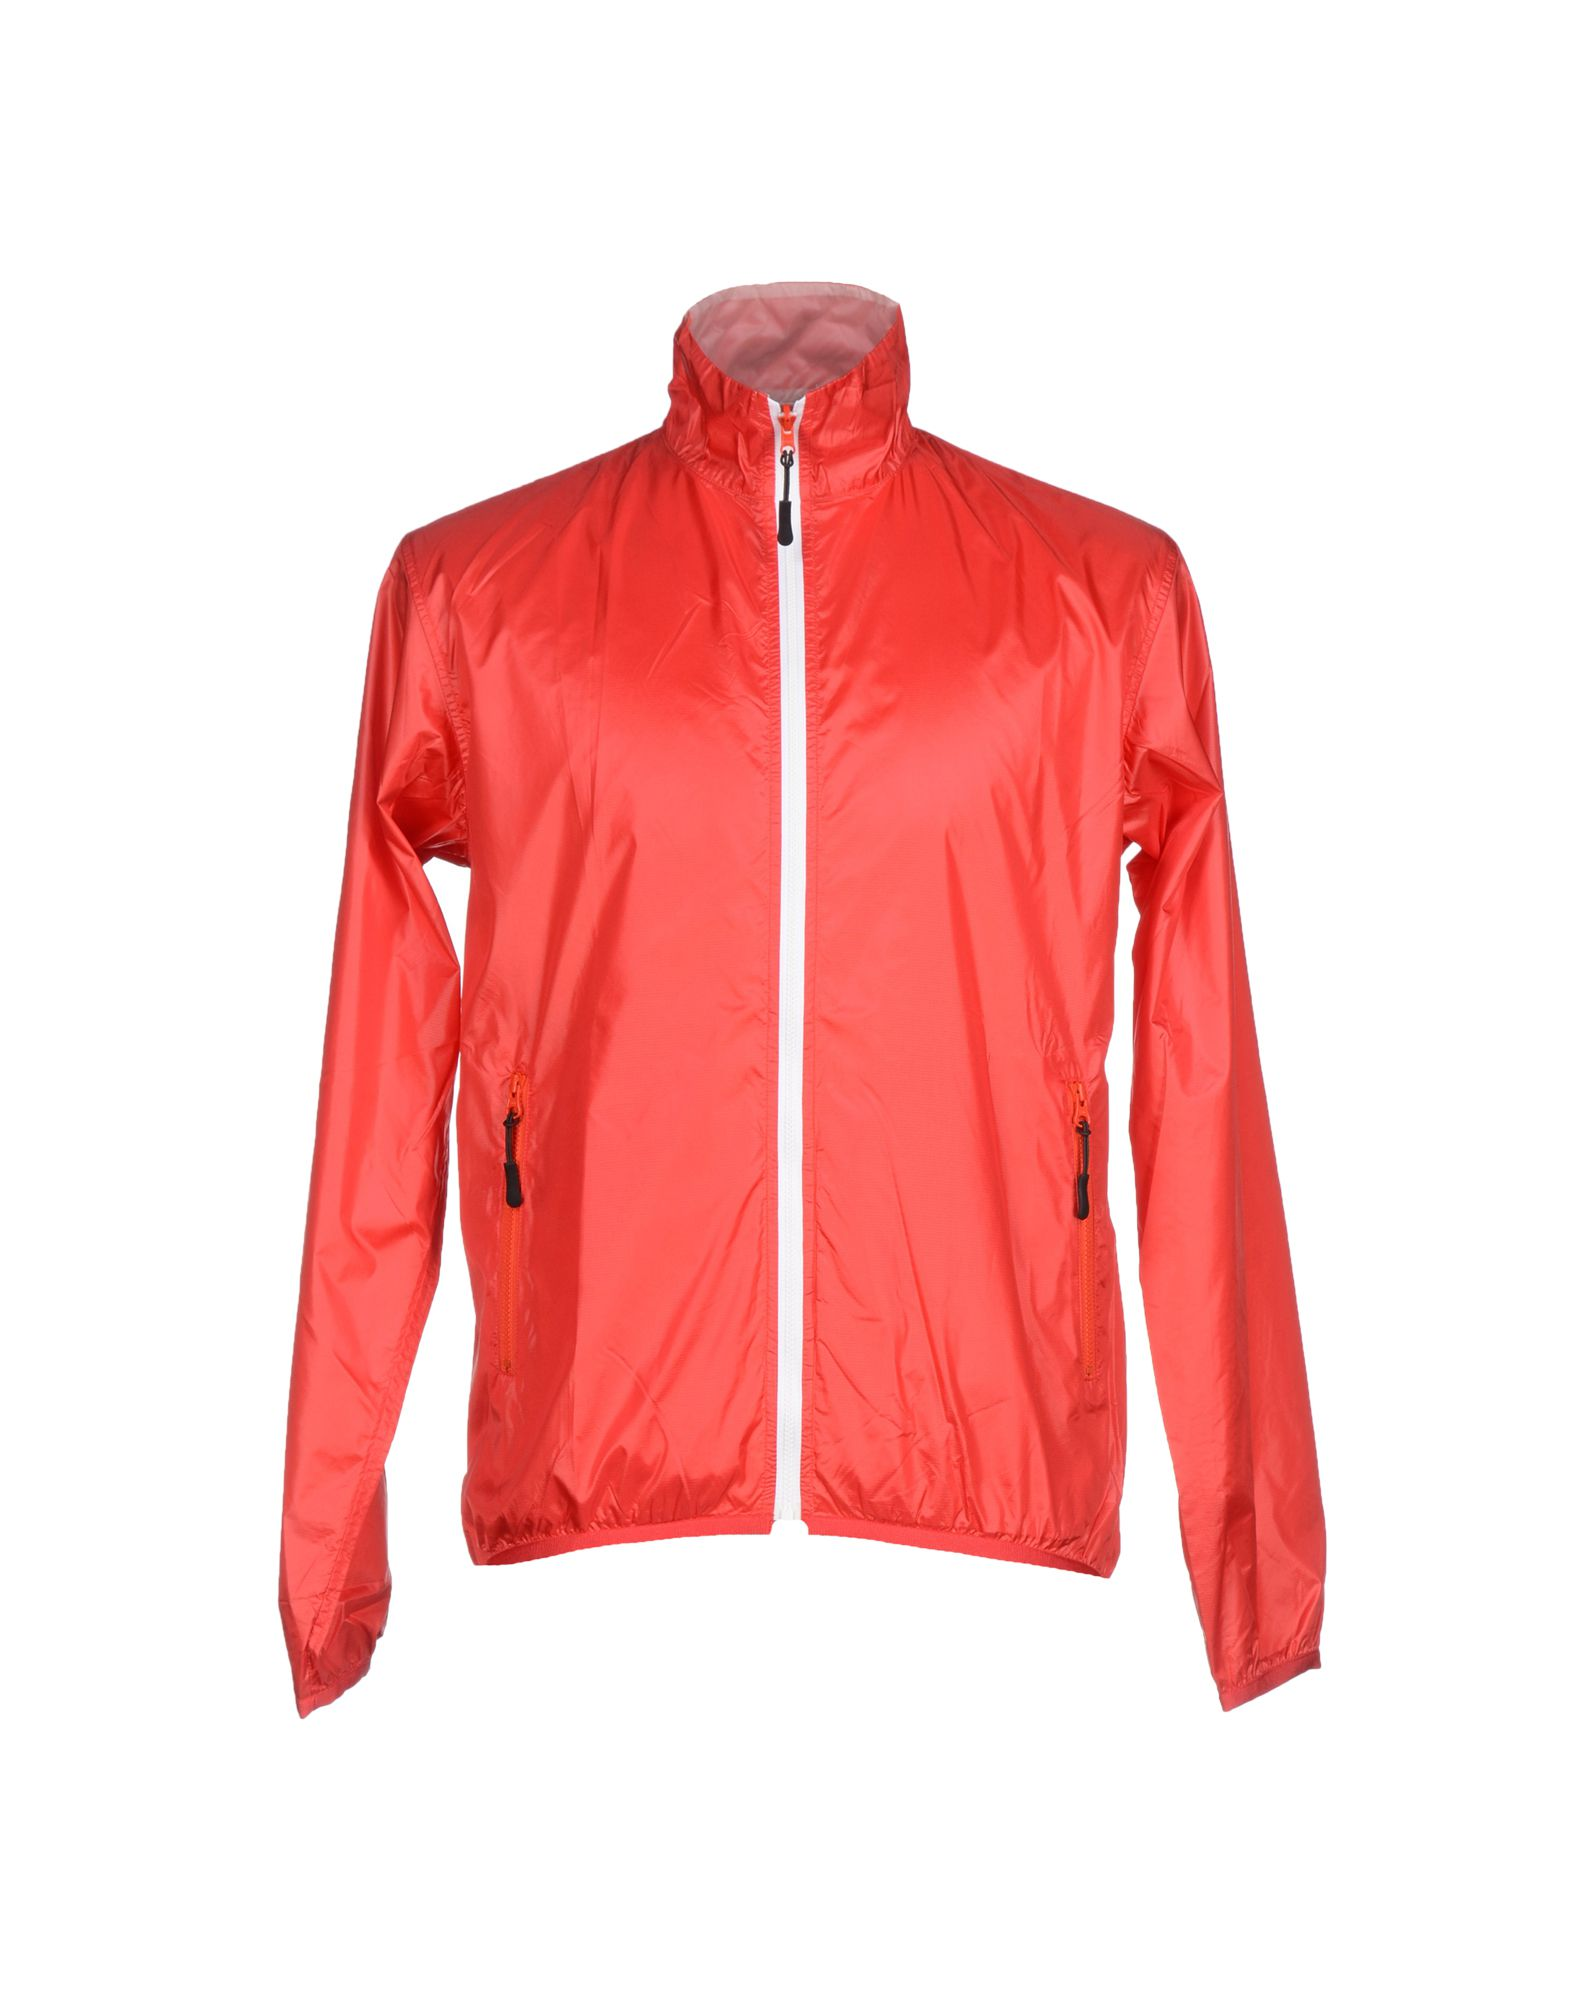 HEAD PORTER PLUS Jacket in Red